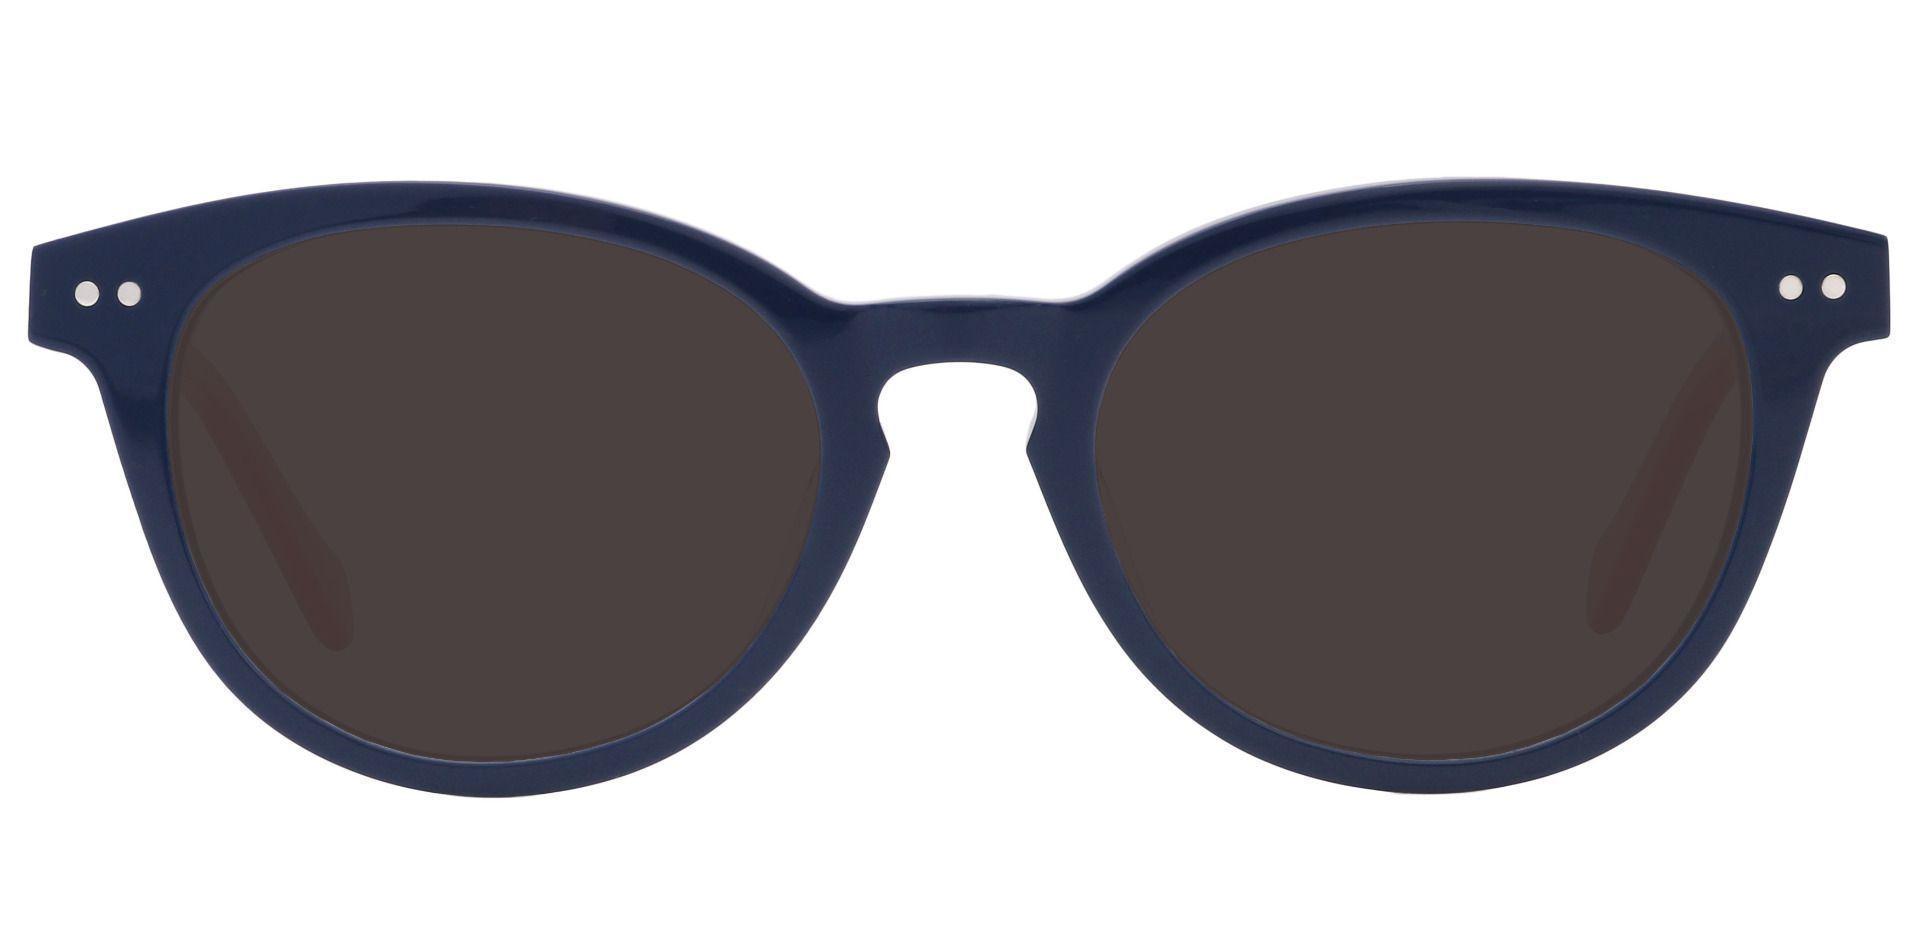 Common Oval Progressive Sunglasses - Blue Frame With Gray Lenses